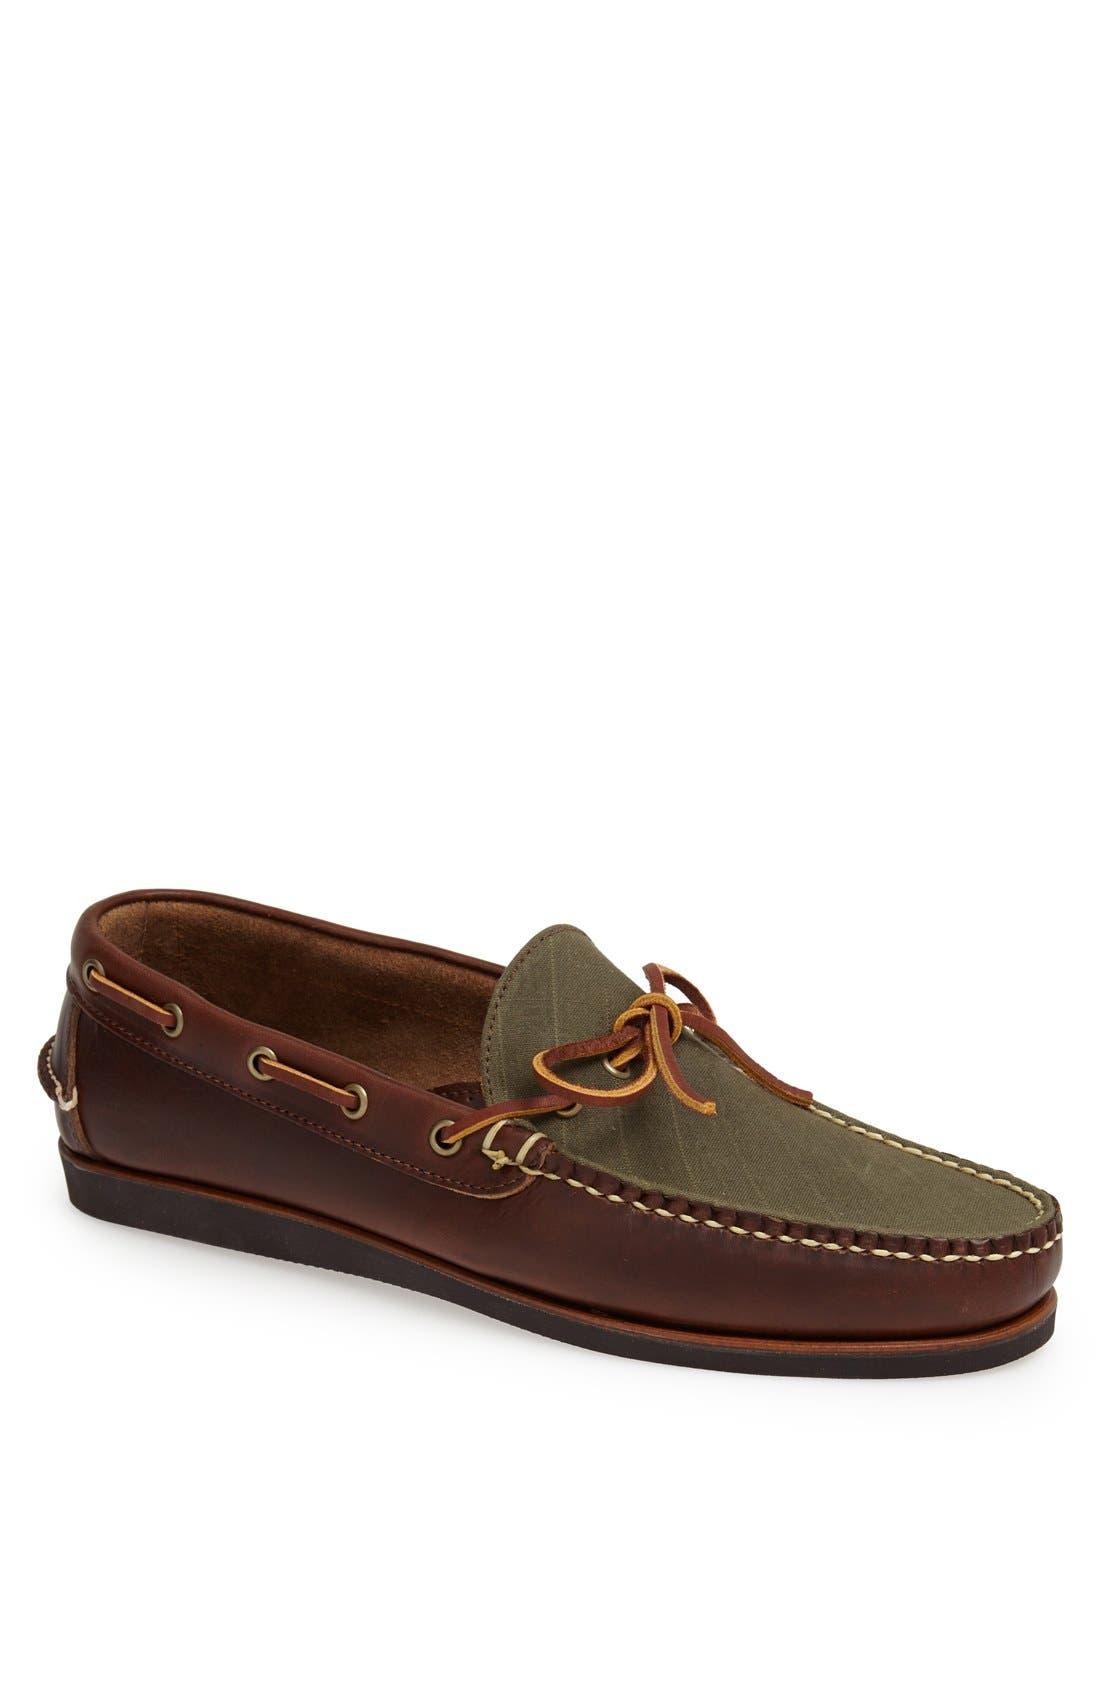 Main Image - Eastland Made in Maine 'Yarmouth USA' Boat Shoe